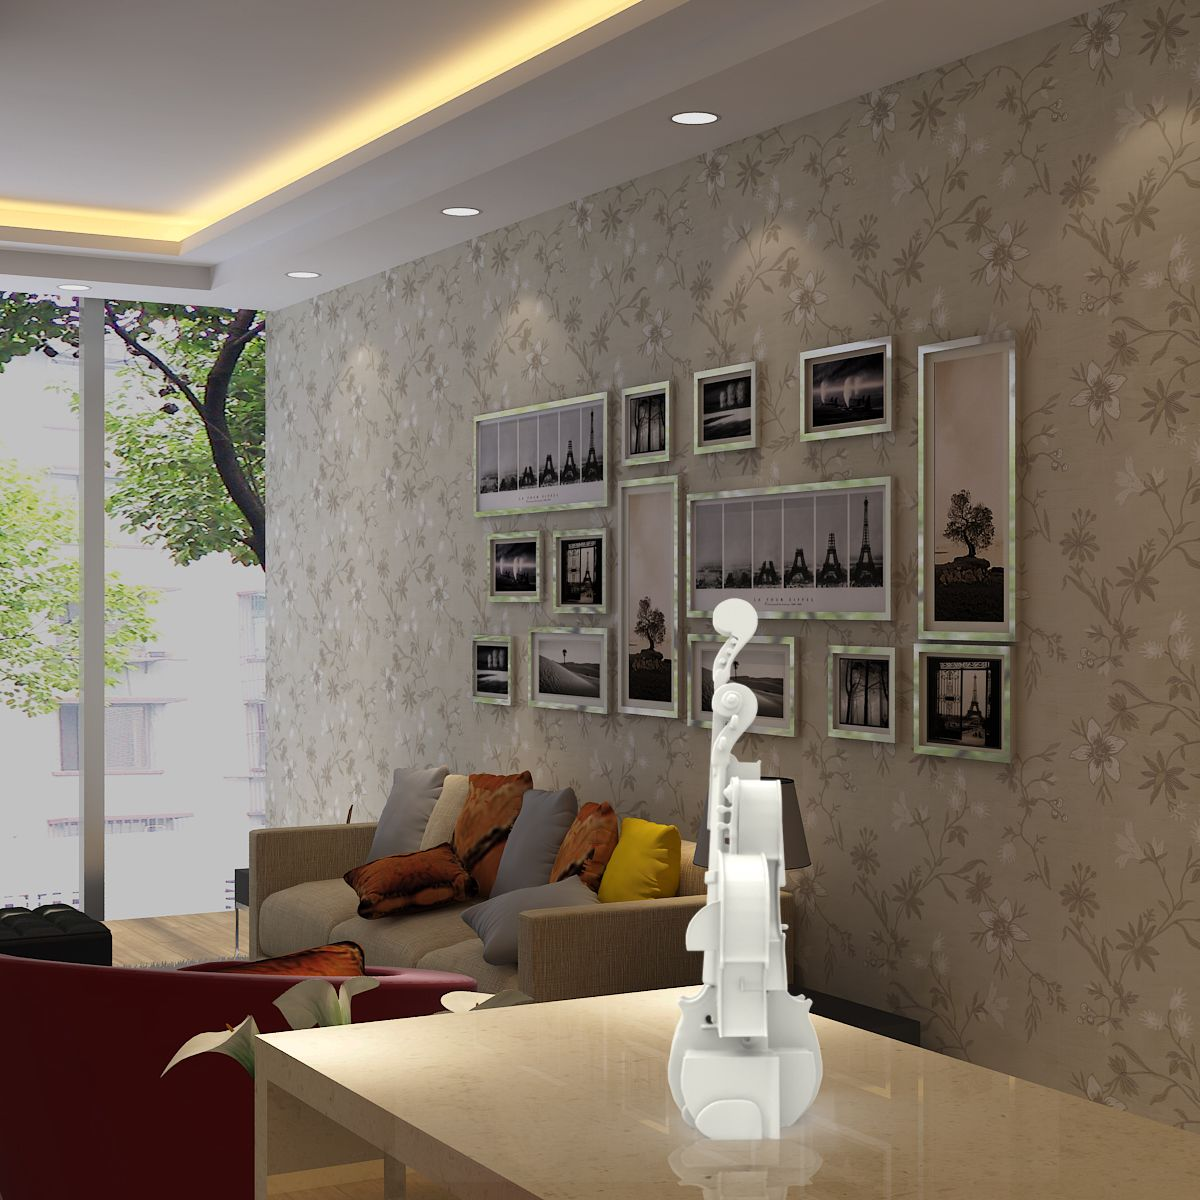 ap28-1-1-52df-w4rb.jpg - Interieur Design Dreidimensionaler Skulptur